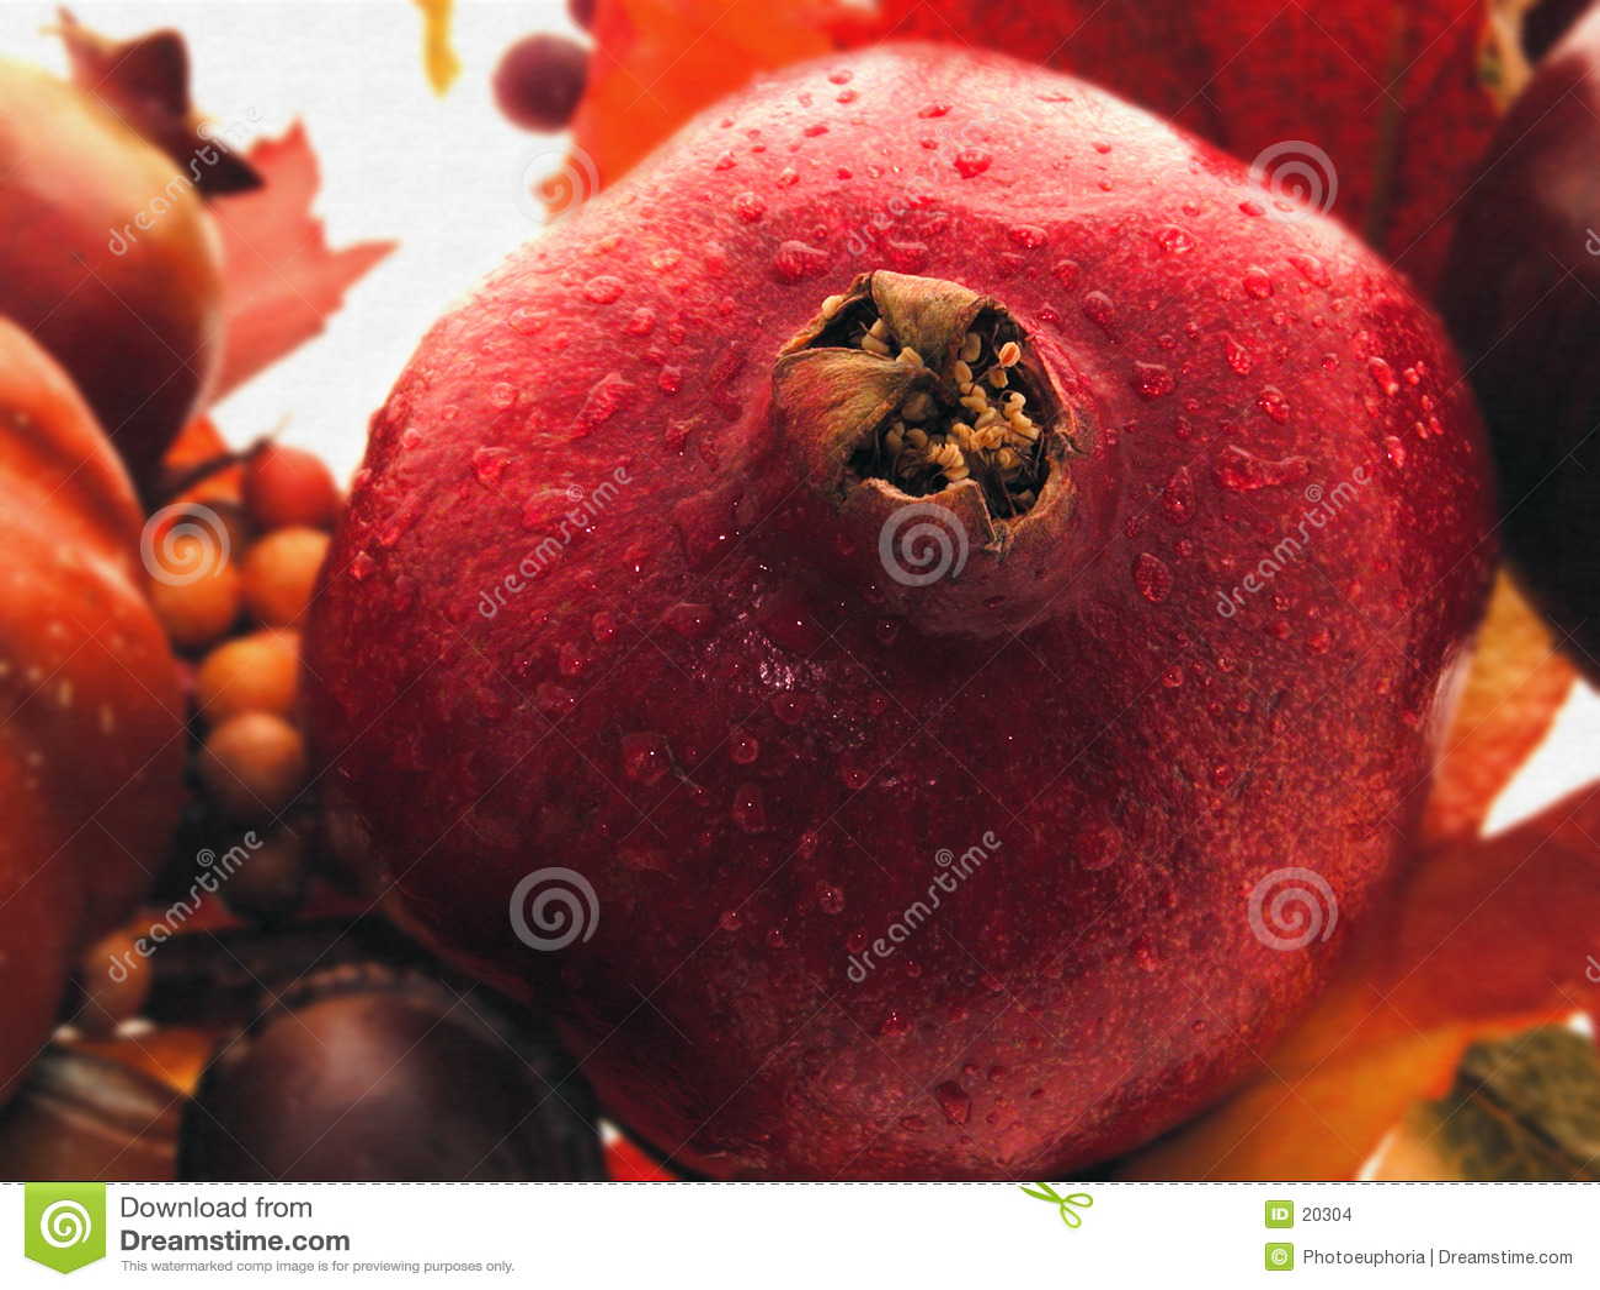 Pomegranate жизни все еще